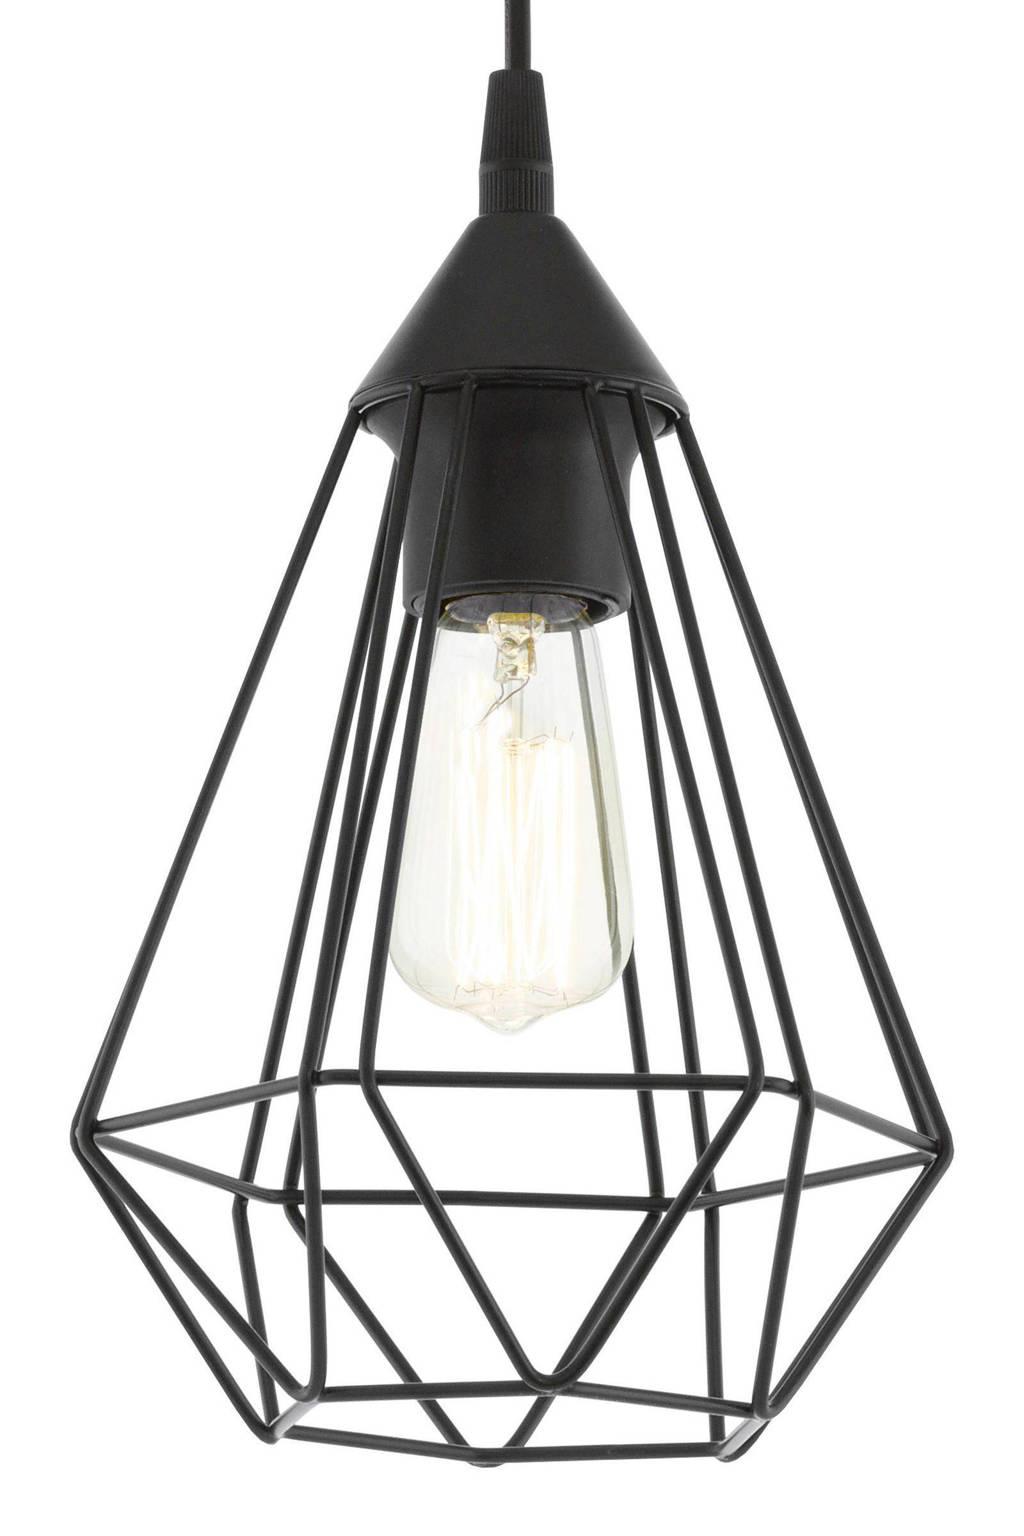 Eglo hanglamp, Zwart